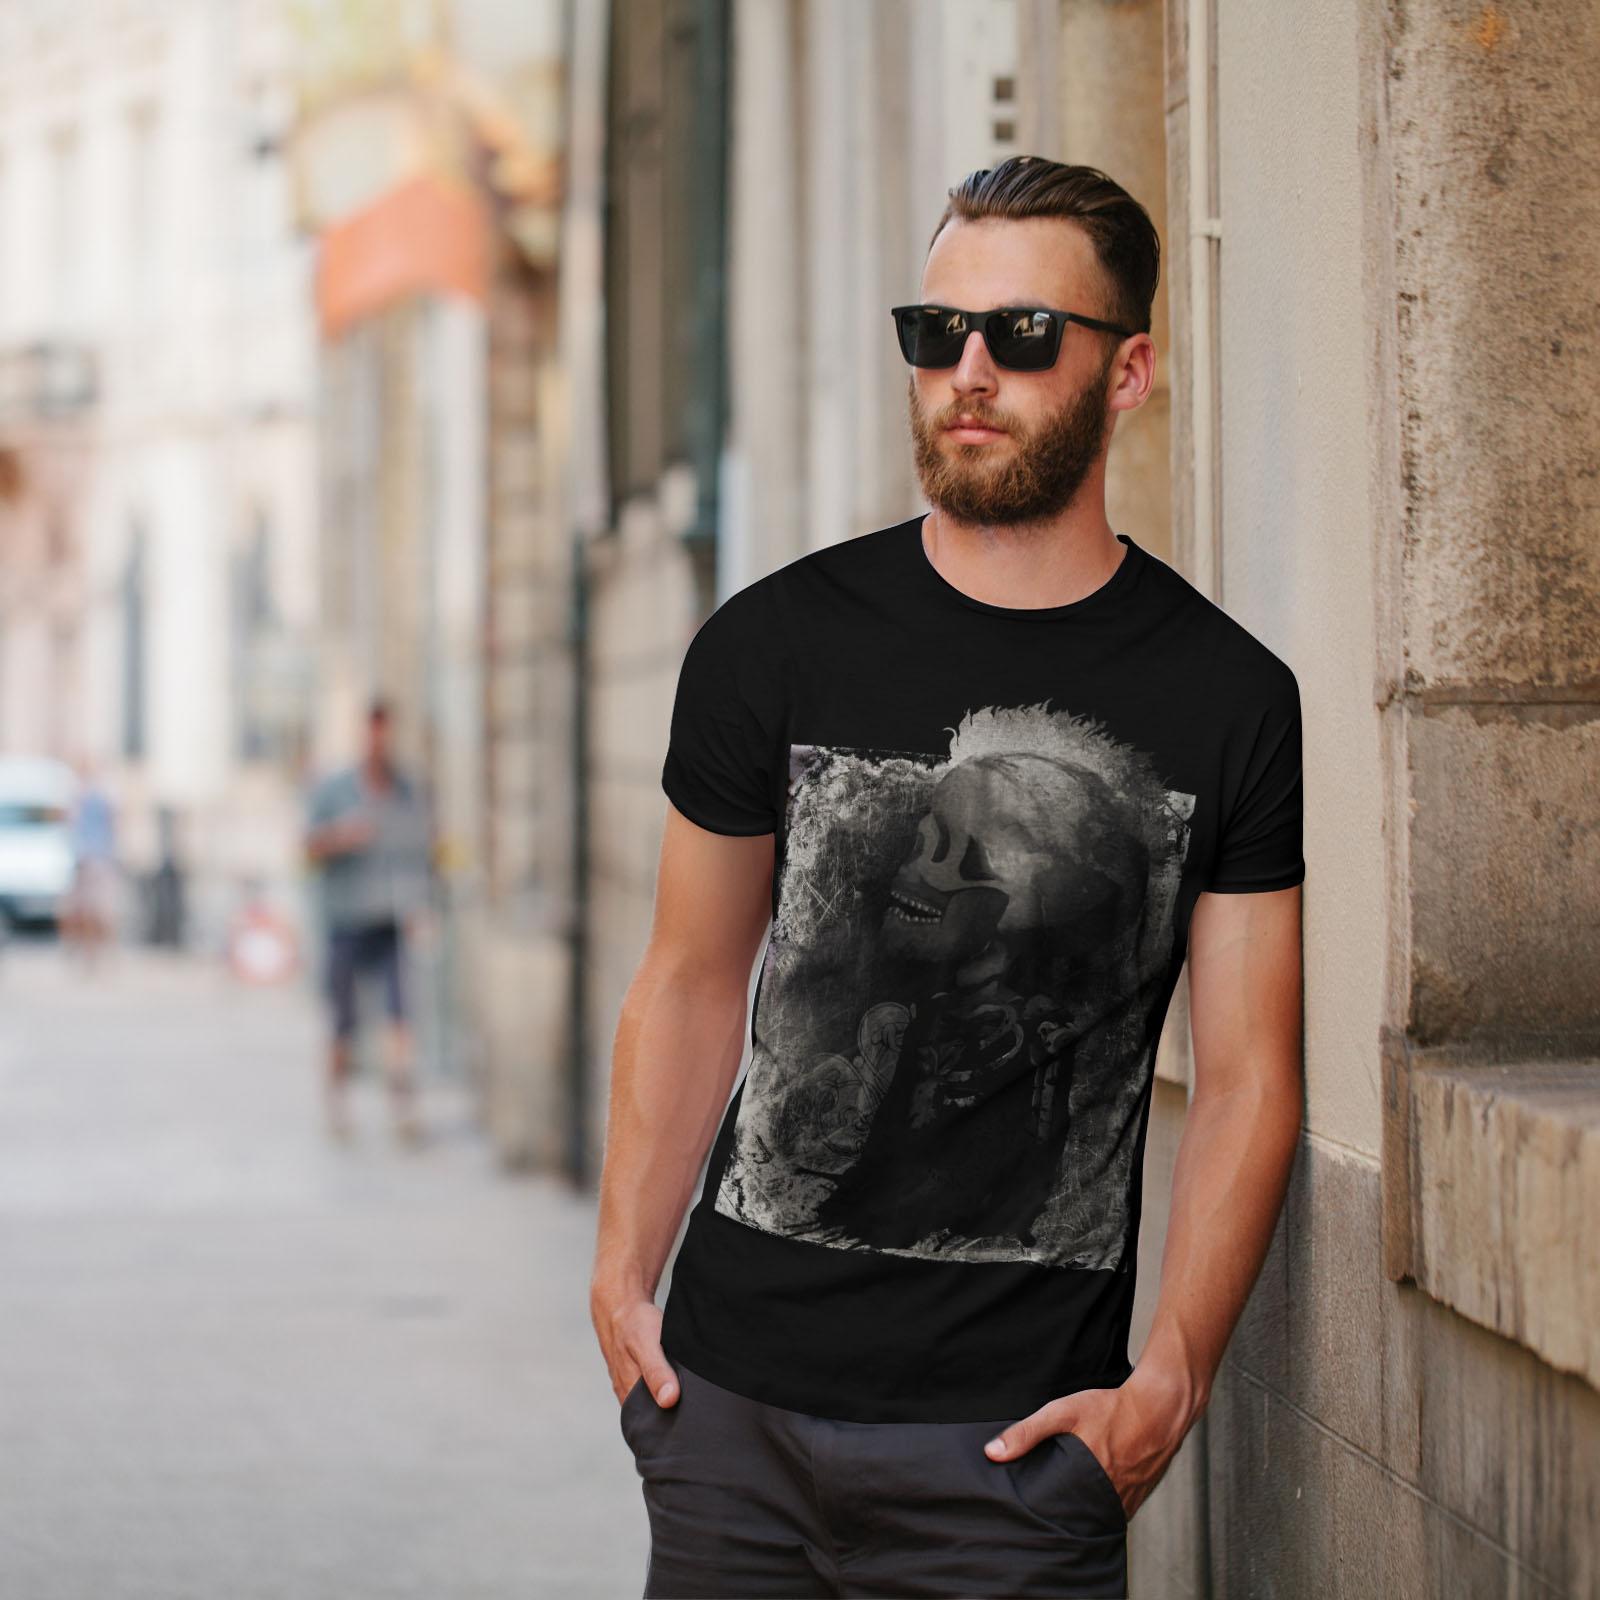 Wellcoda Punk Art Metal Metal Metal Rock T-shirt homme indien, conception graphique imprimé Tee c94dd3